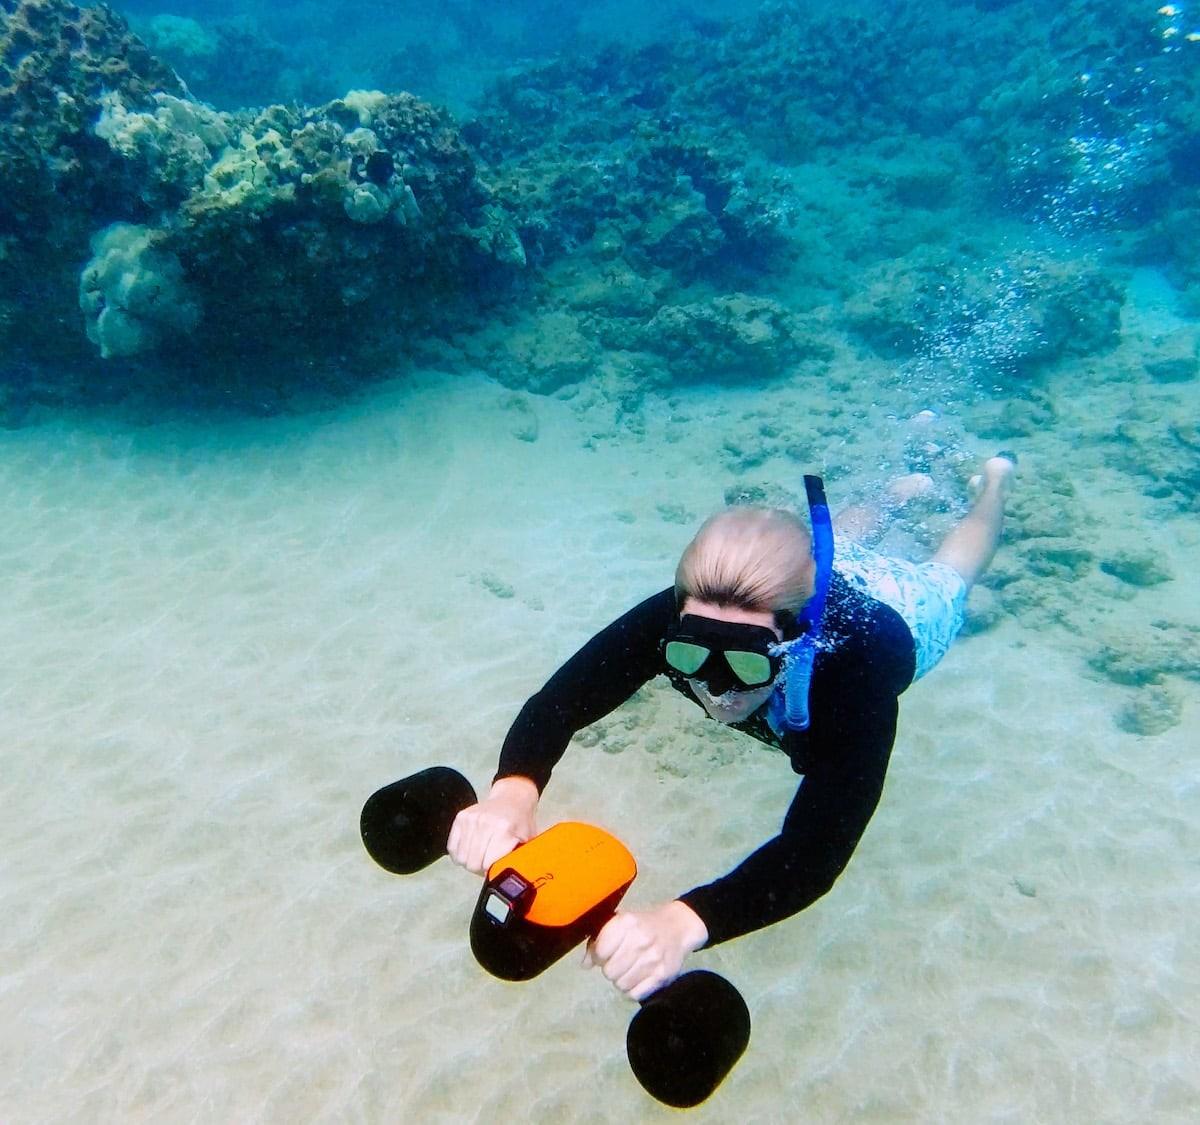 Geneinno S2 portable sea scooter lets you explore even deeper underwater